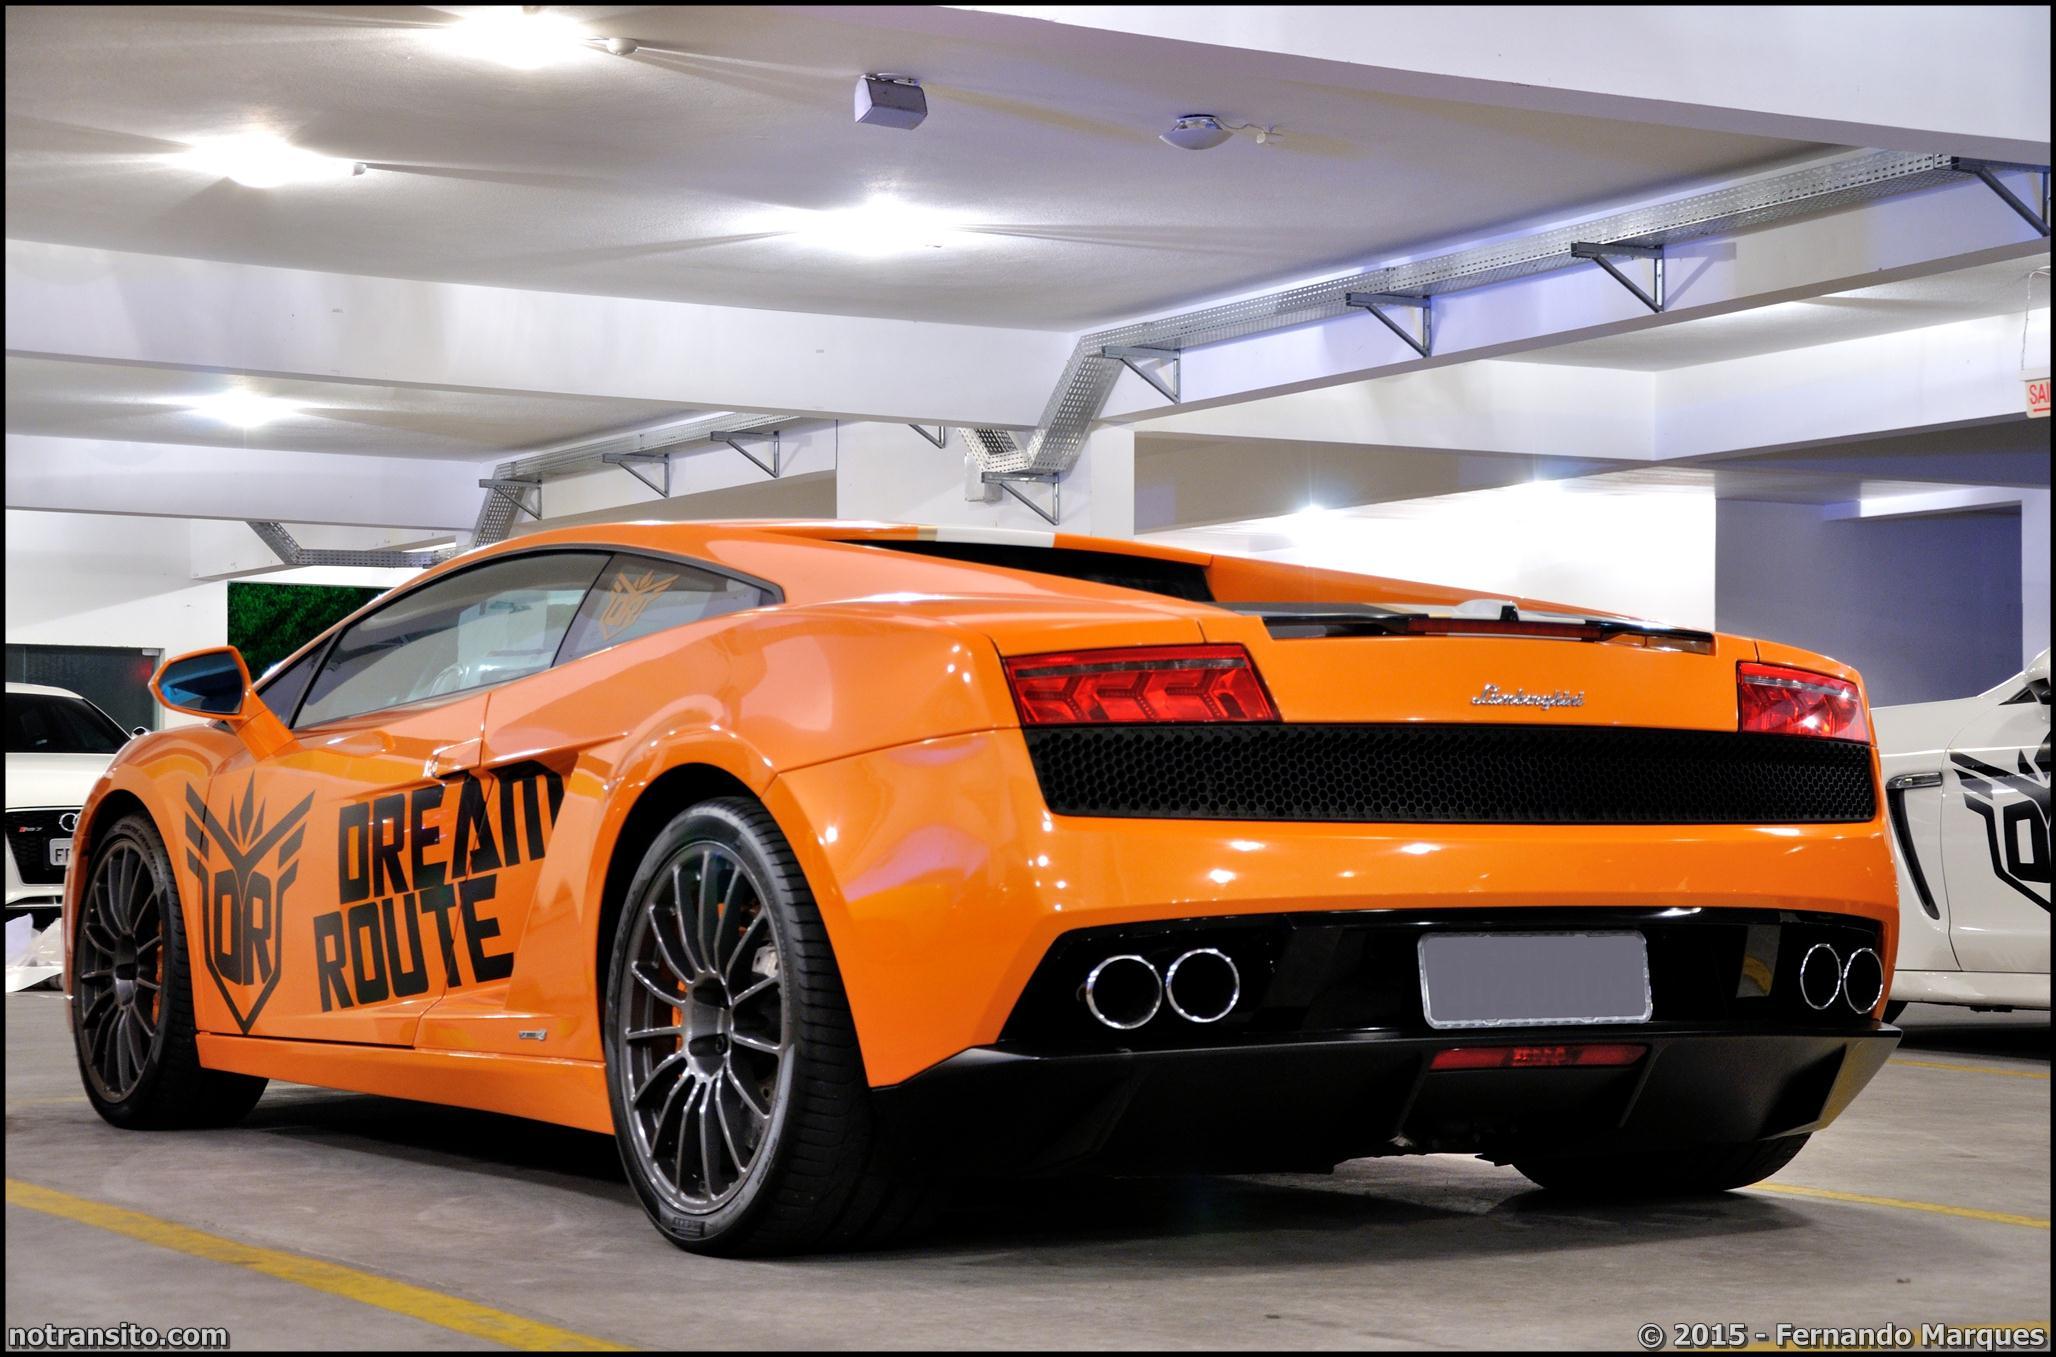 Dream Route, Lamborghini Galardo LP 550-2 Valentino Balboni